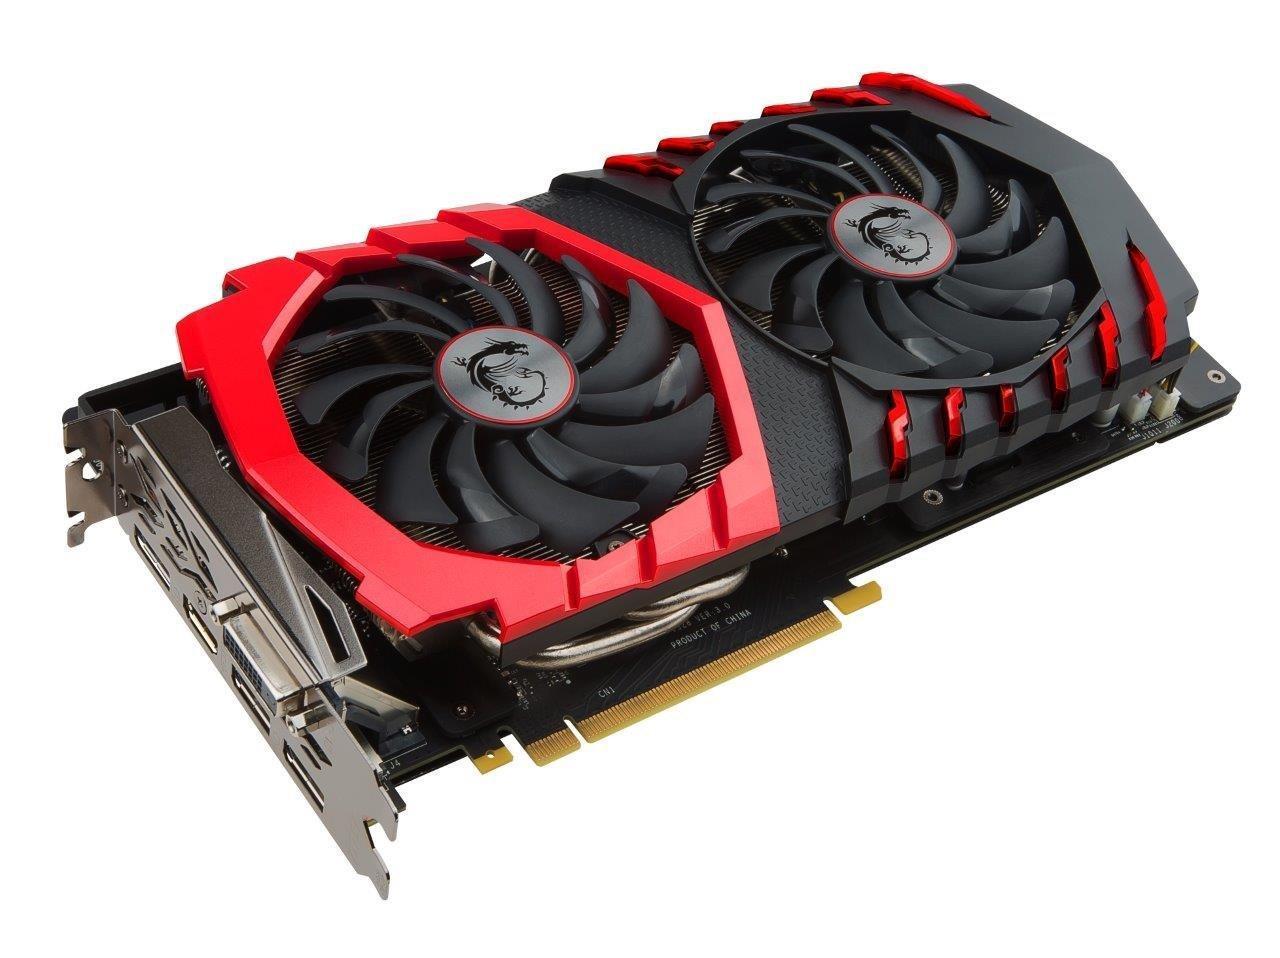 MSI GAMING GeForce GTX 1060 6GB GDRR5 192-bit HDCP Support DirectX 12 Dual  TORX 2 0 Fan VR Ready Graphics Card (GTX 1060 GAMING X 6G)